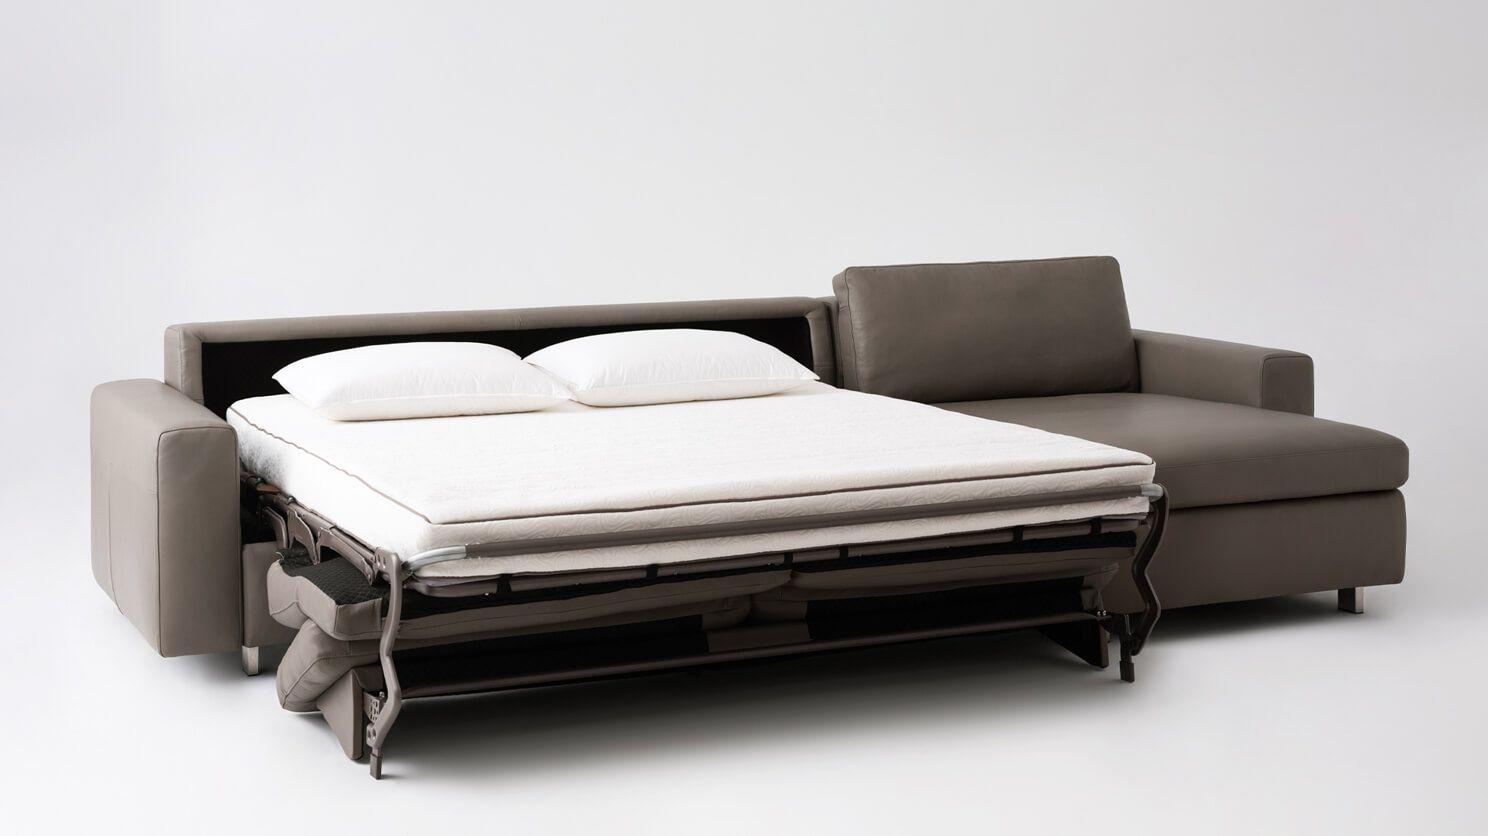 Reva 2 Piece Sectional Sleeper Sofa With Storage Chaise Eq3 Sectional Sleeper Sofa Storage Chaise Sleeper Sofa